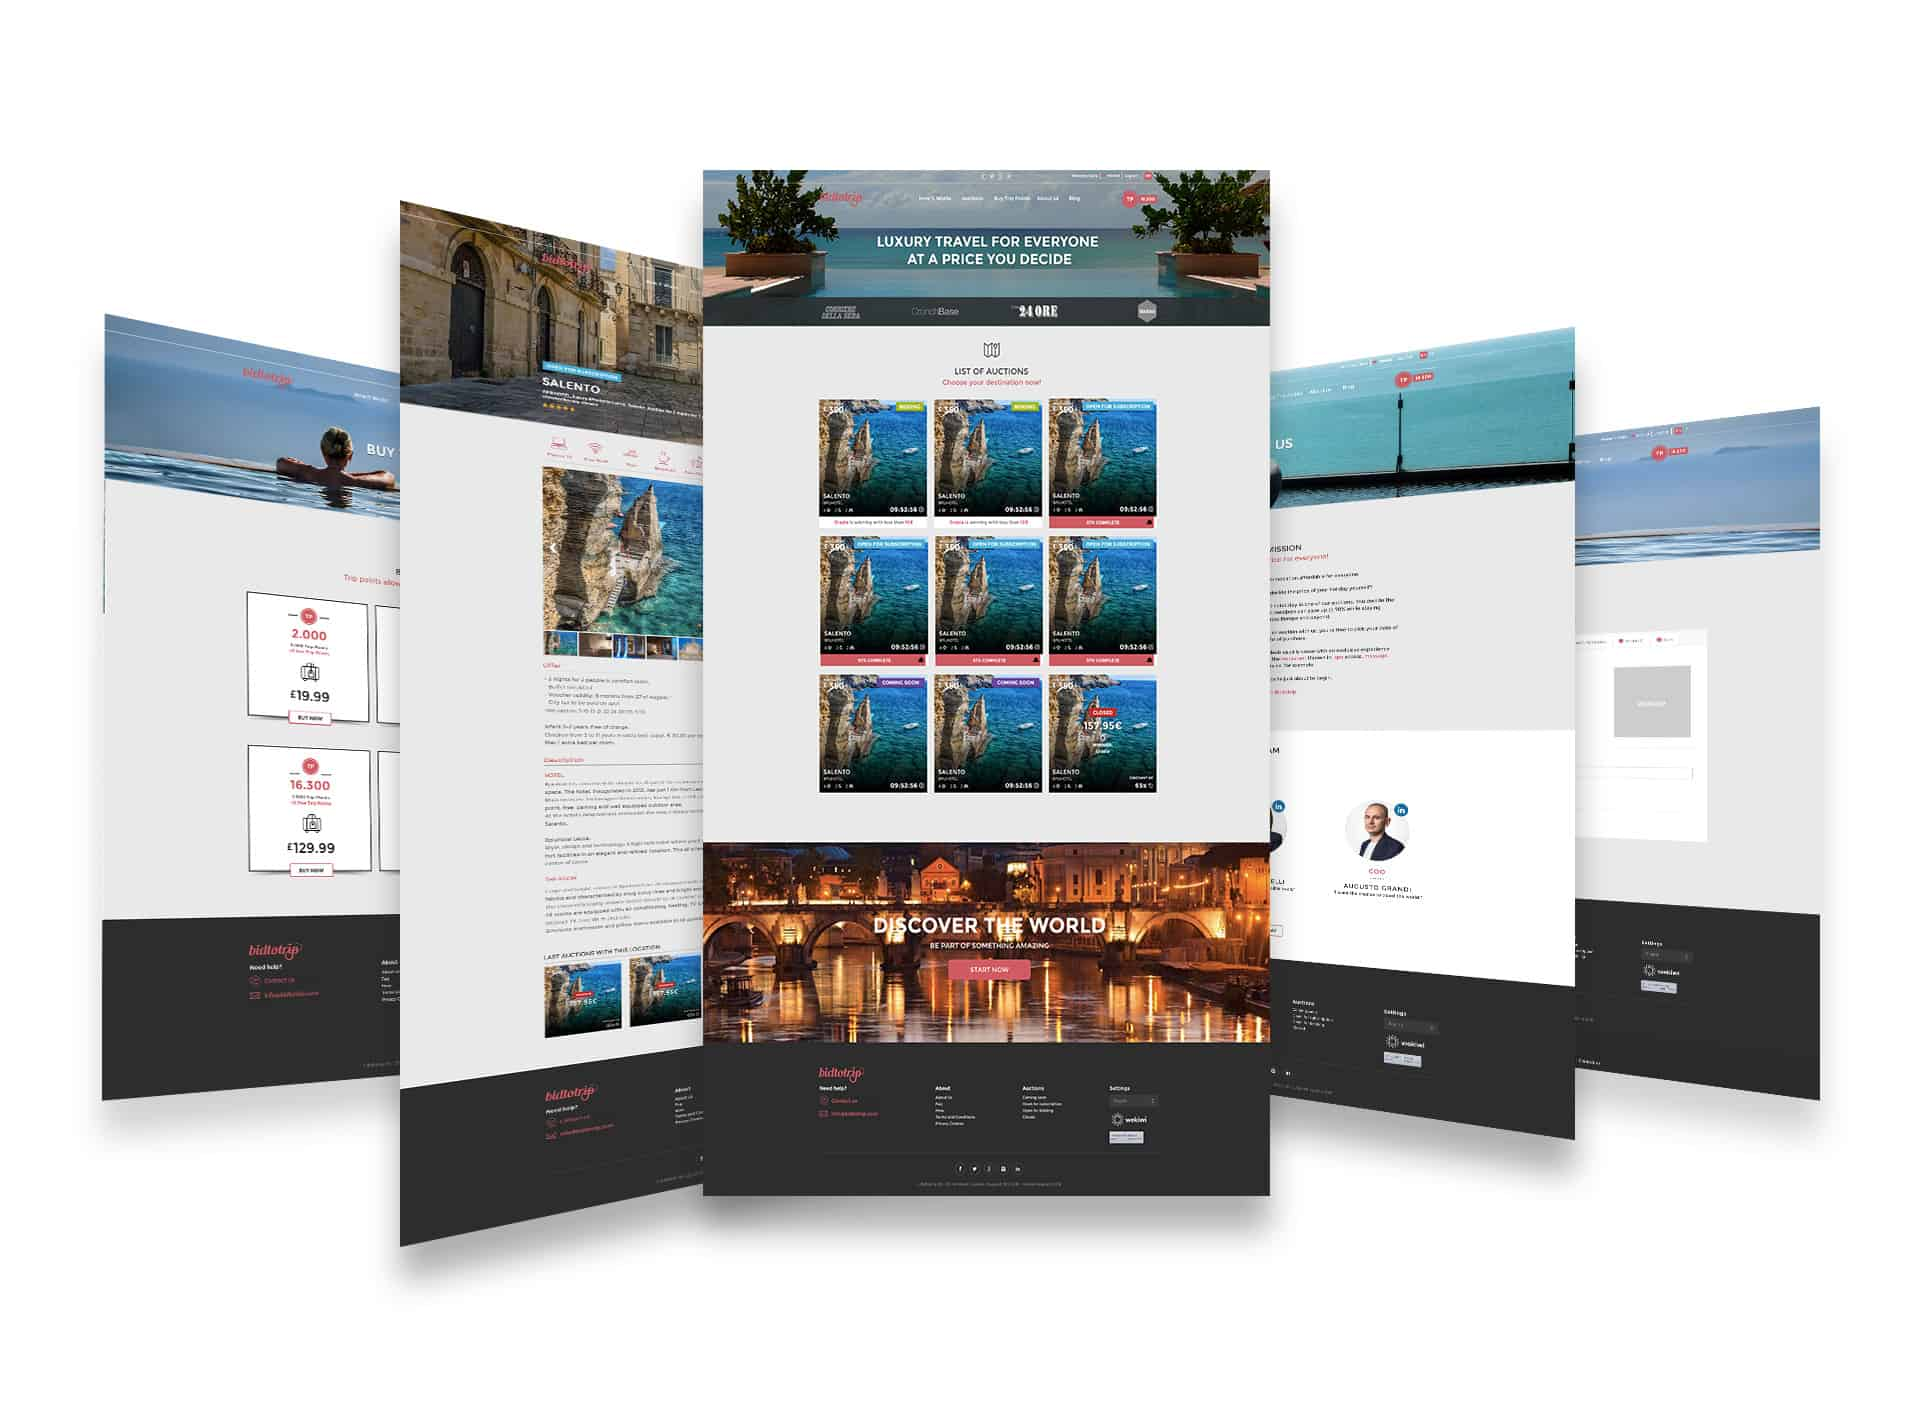 PROPAGANDA - bidtotrip screens